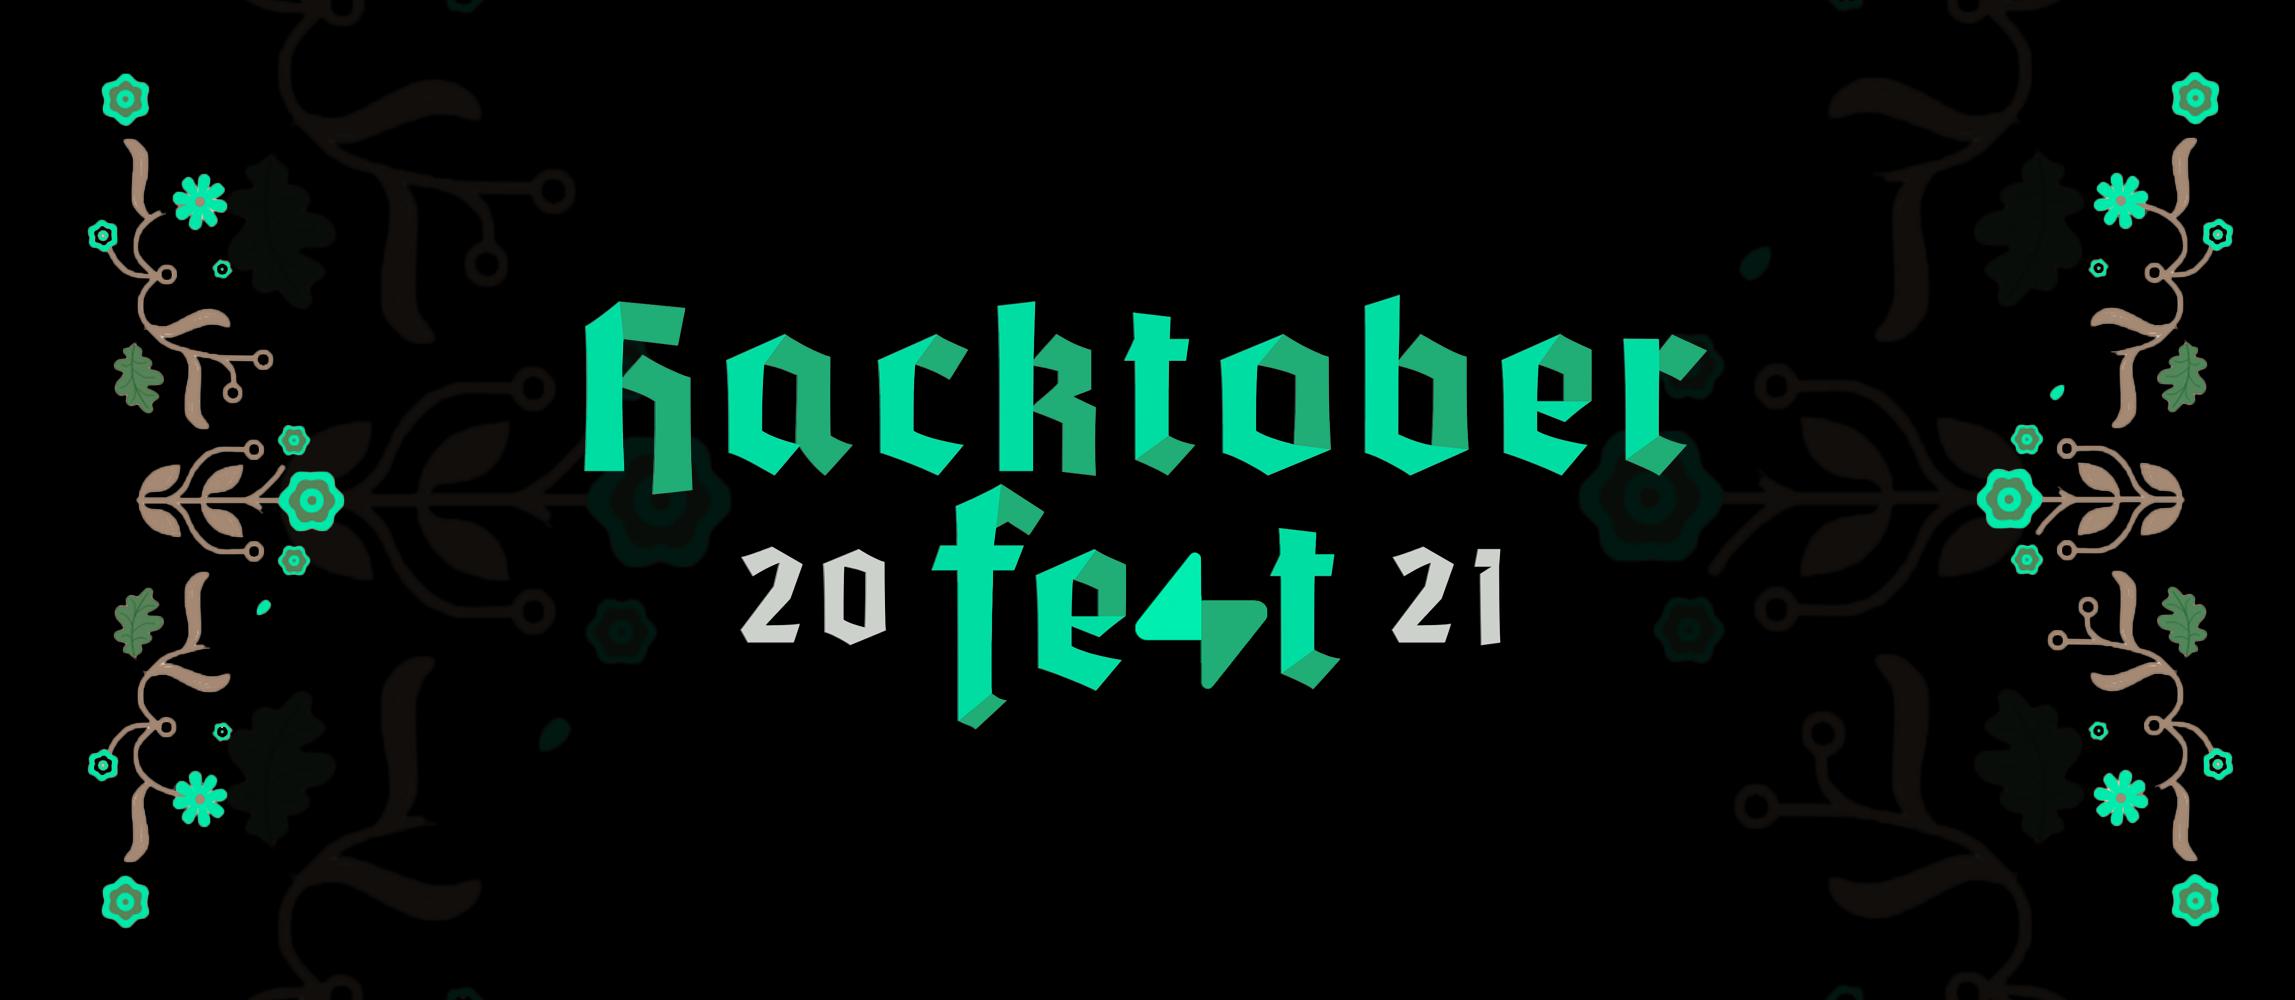 Supabase Hacktoberfest Hackathon